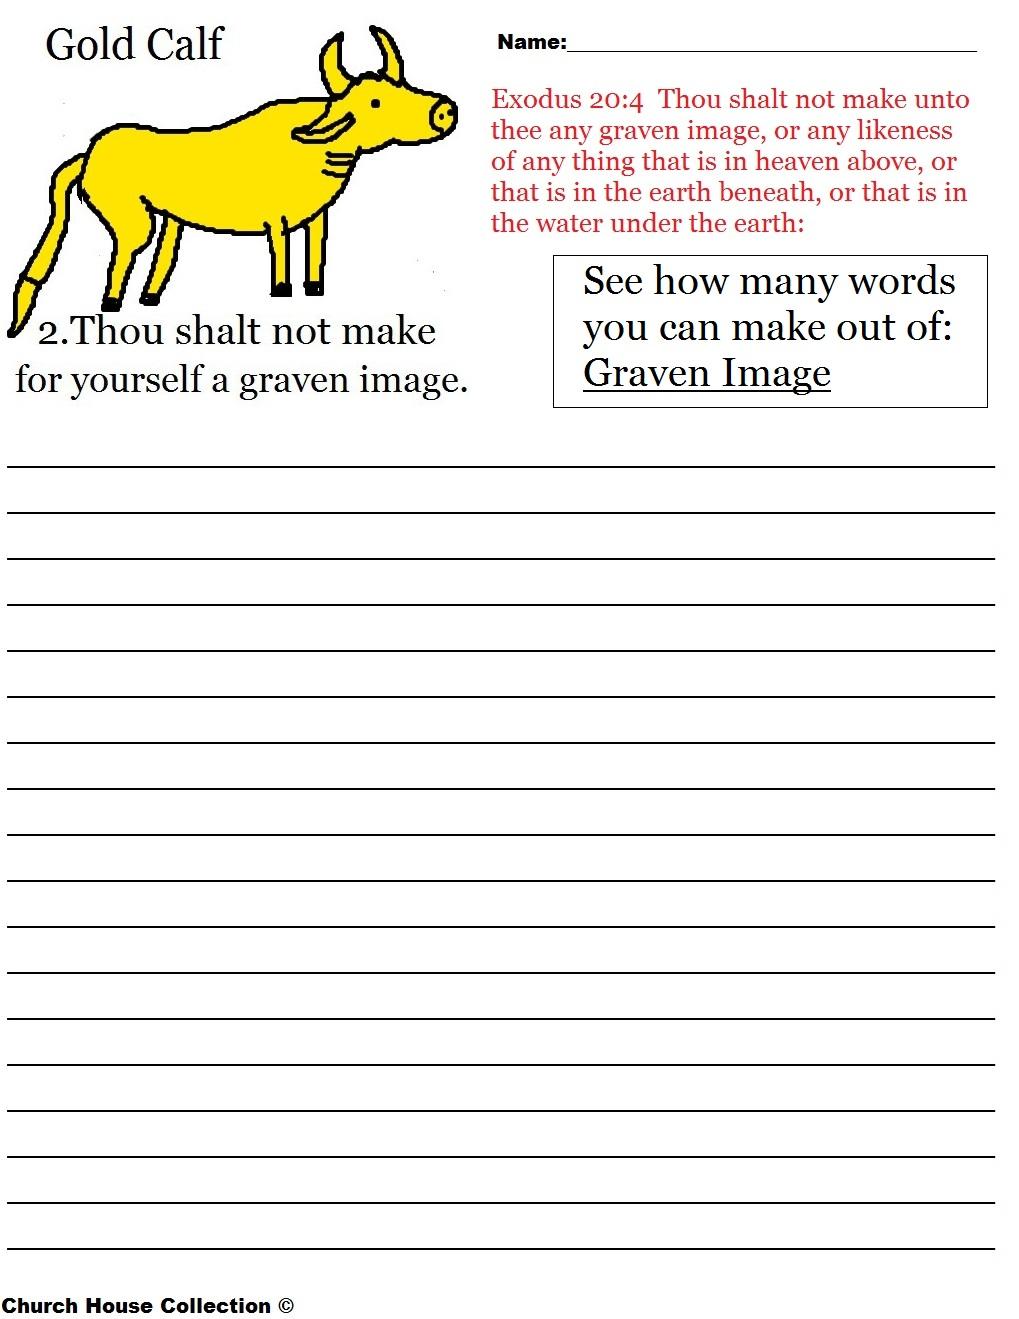 Ten Commandments Worksheets Photos - Beatlesblogcarnival math worksheets, worksheets, free worksheets, education, and grade worksheets Ten Commandments Worksheets For Kids 1319 x 1019